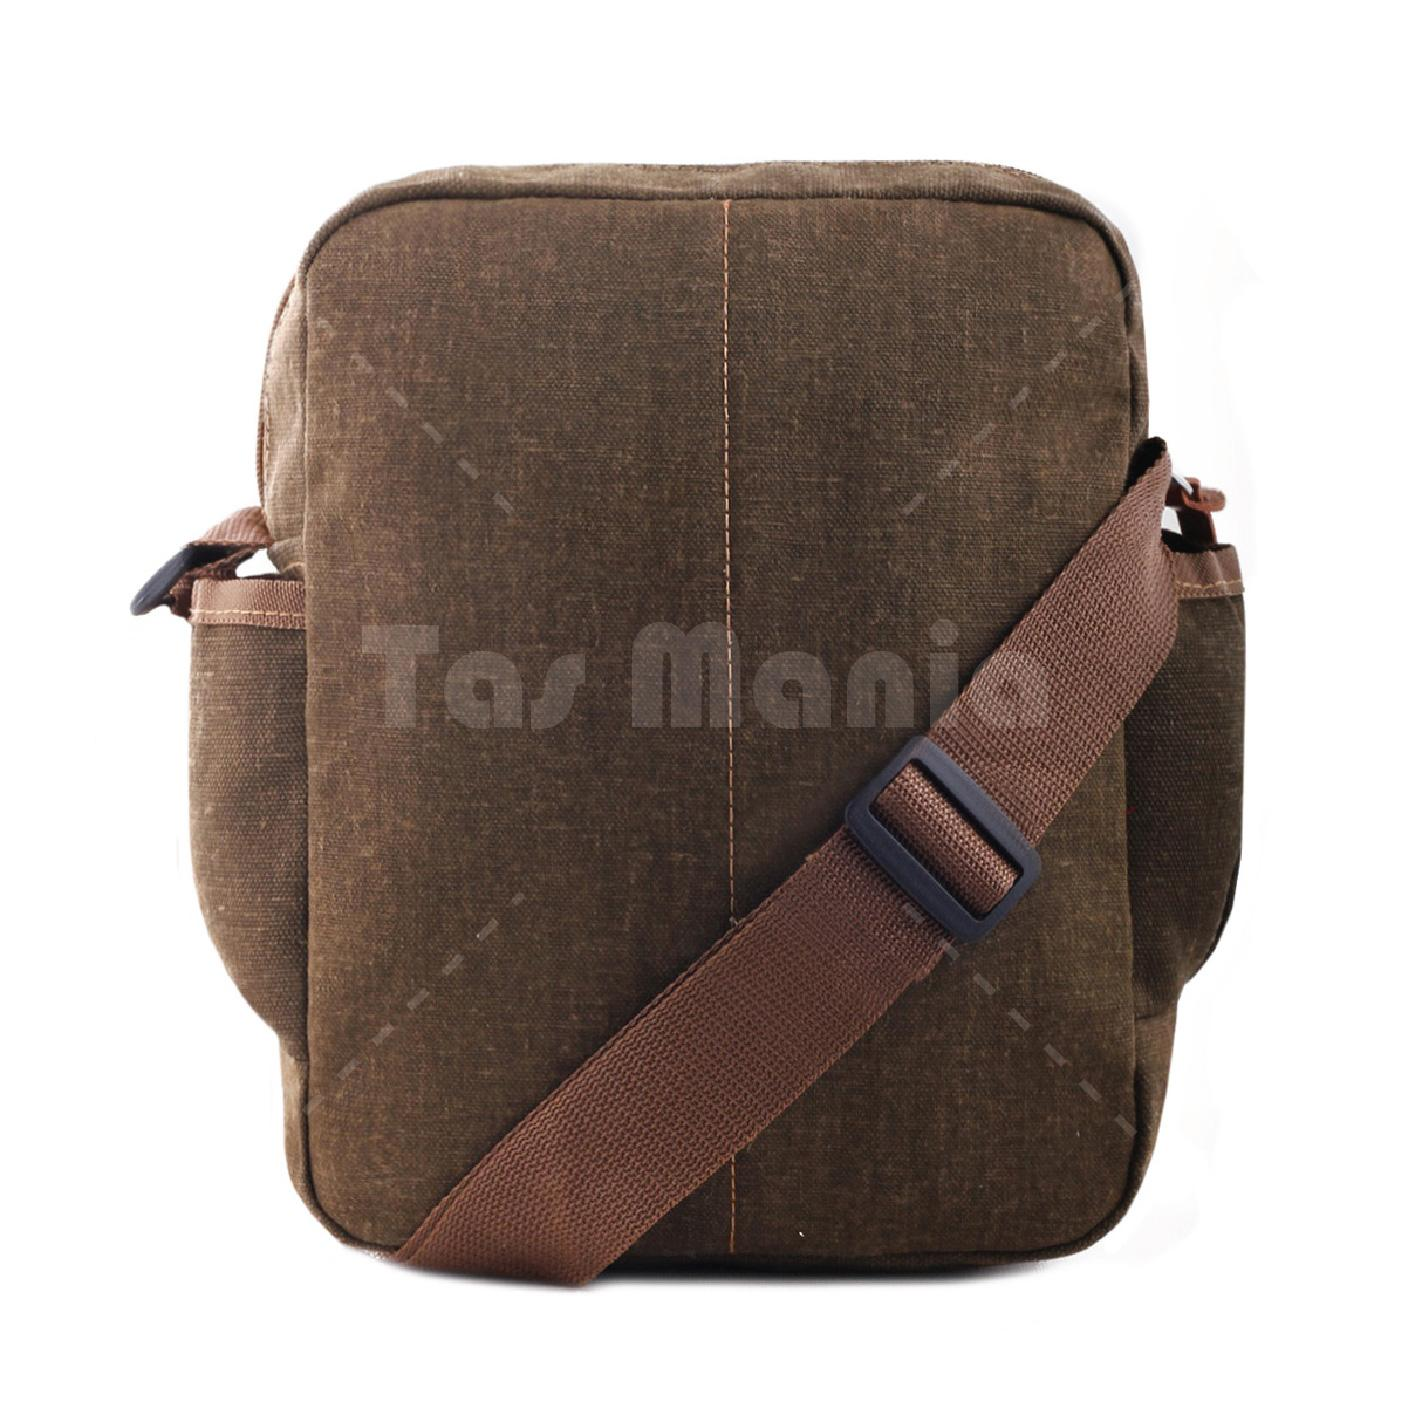 ... Tas Selempang Gear Bag Slingbag Coast Guard Army - Khaki Tas Pria Tas Messenger Tas Slempang ...